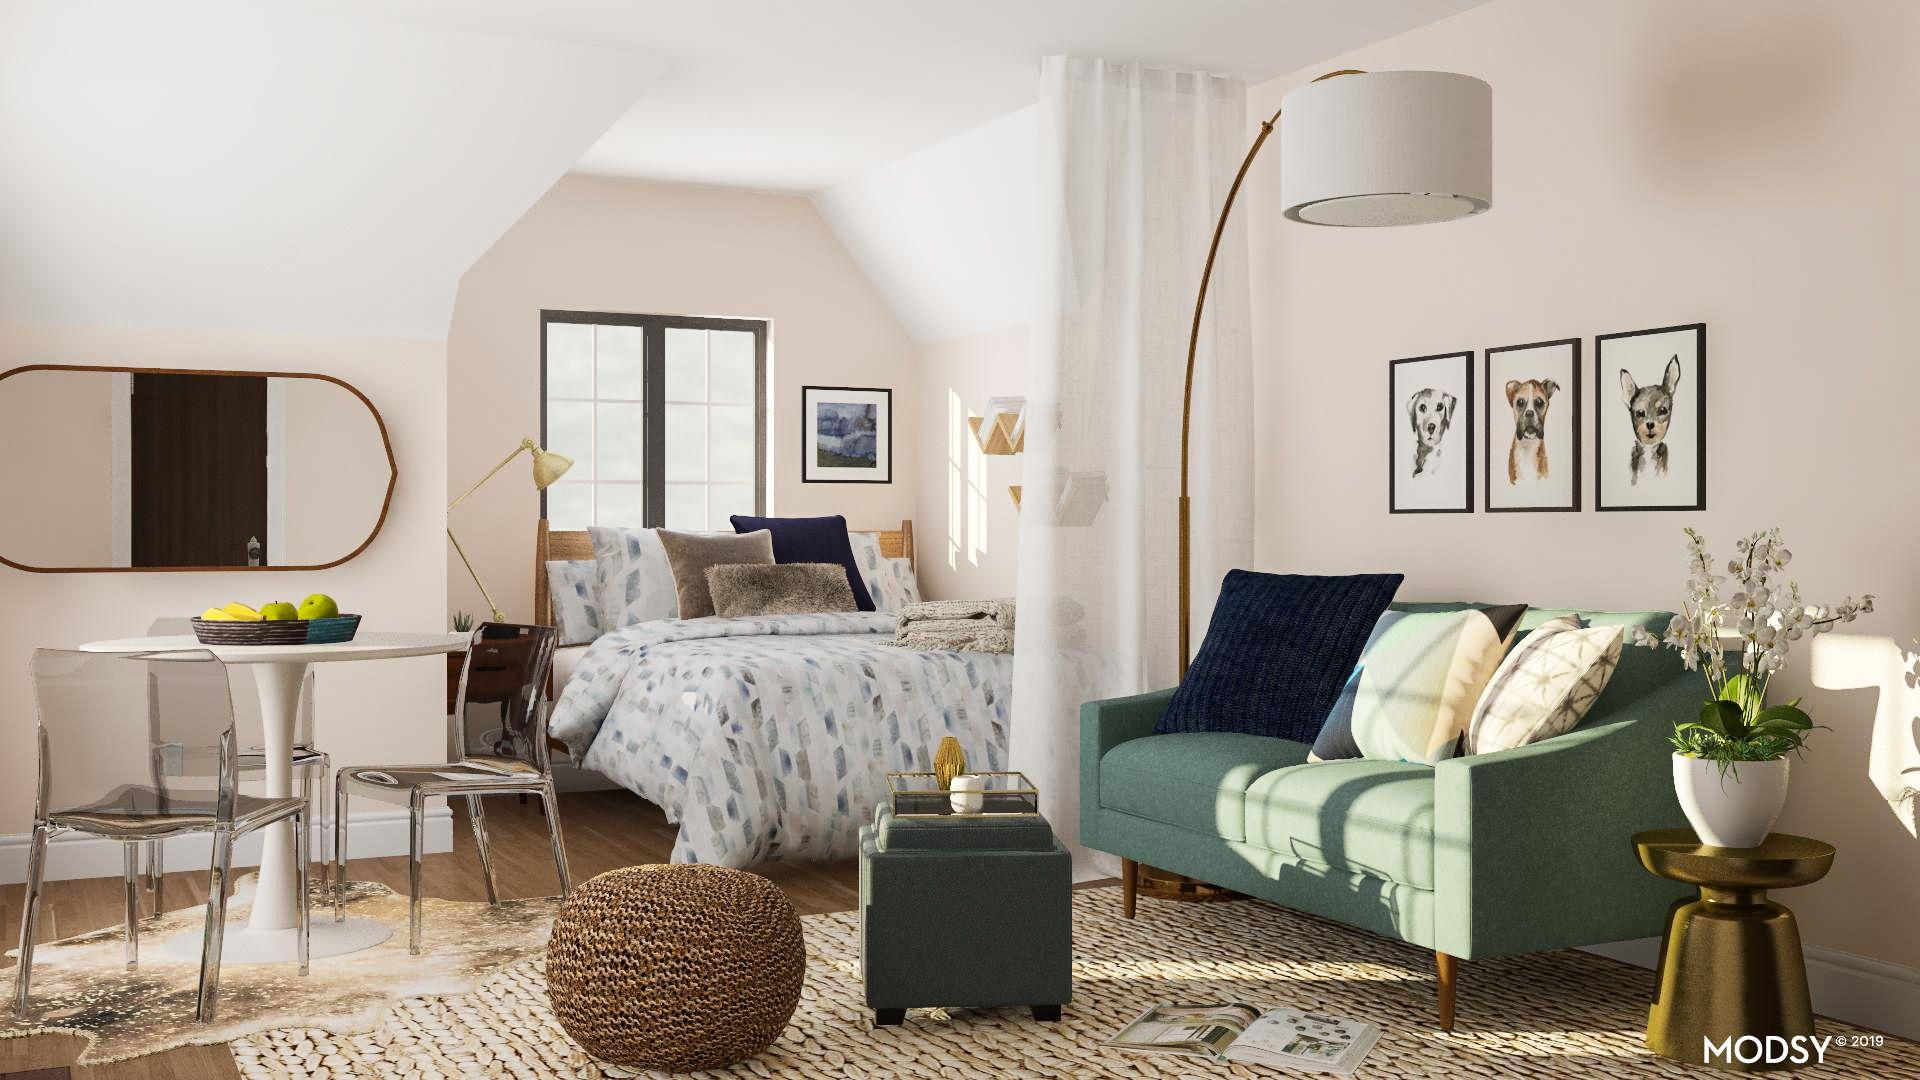 Living In A Studio Apartment 7 Space, Studio Living Room Furniture